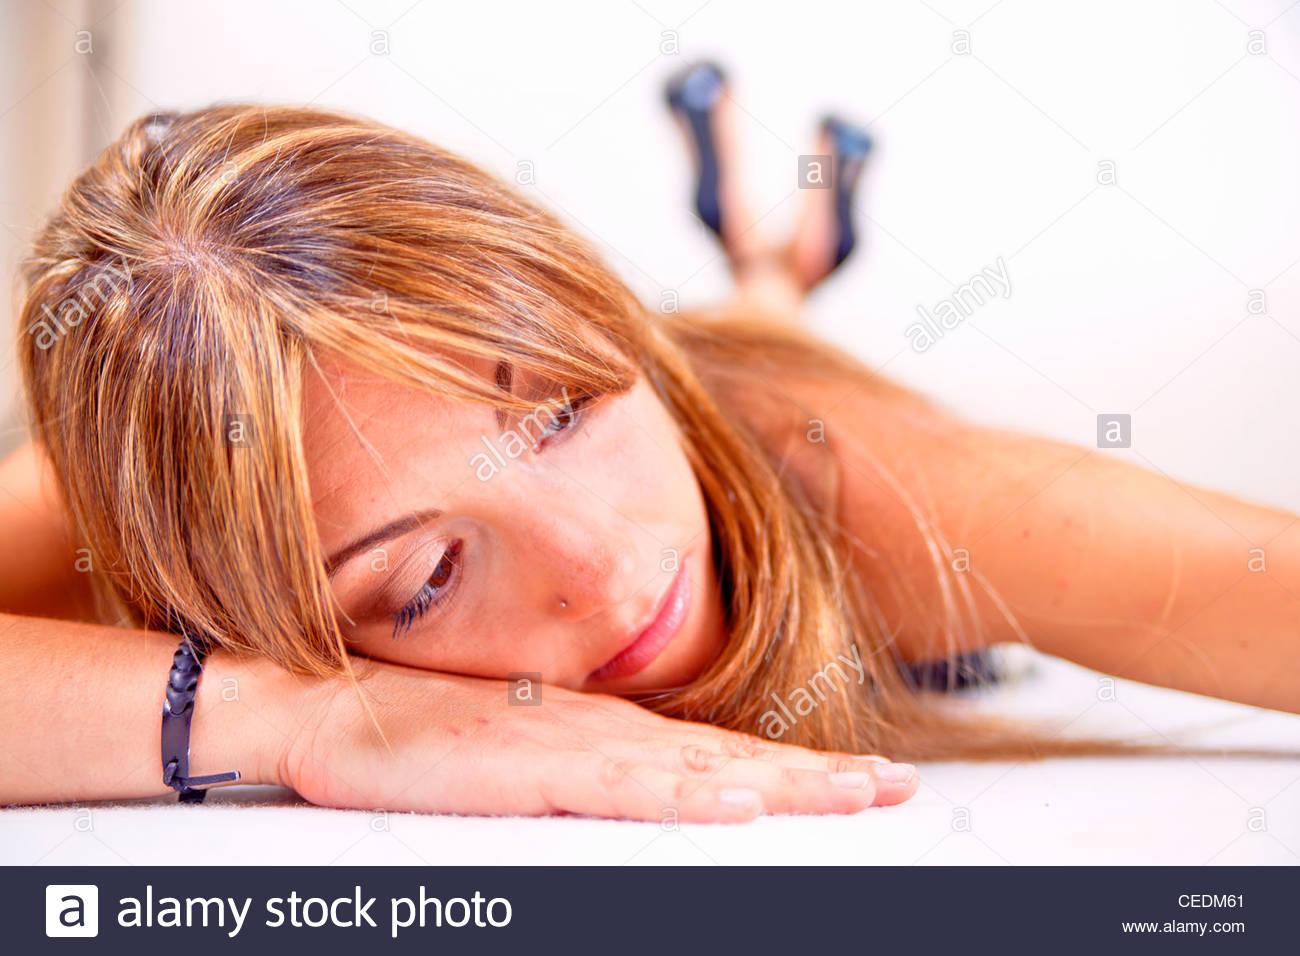 Woman model resting - Stock Image